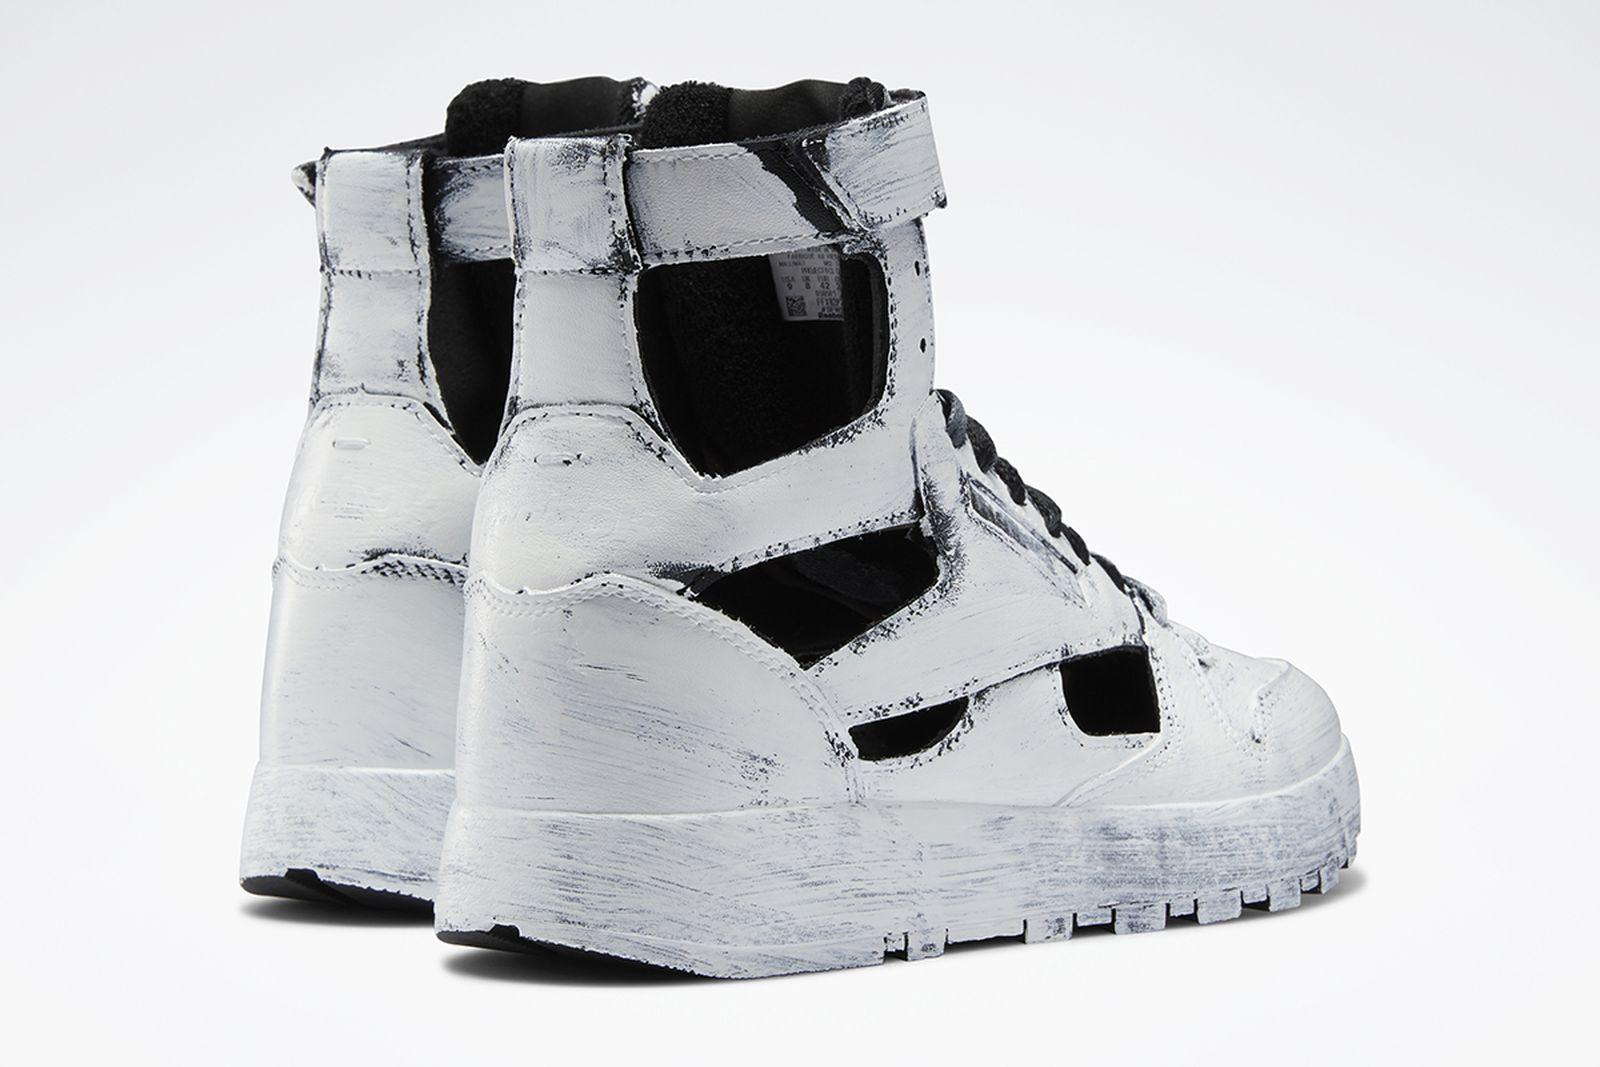 Maison Margiela Reebok Classic Leather Tabi High (2)